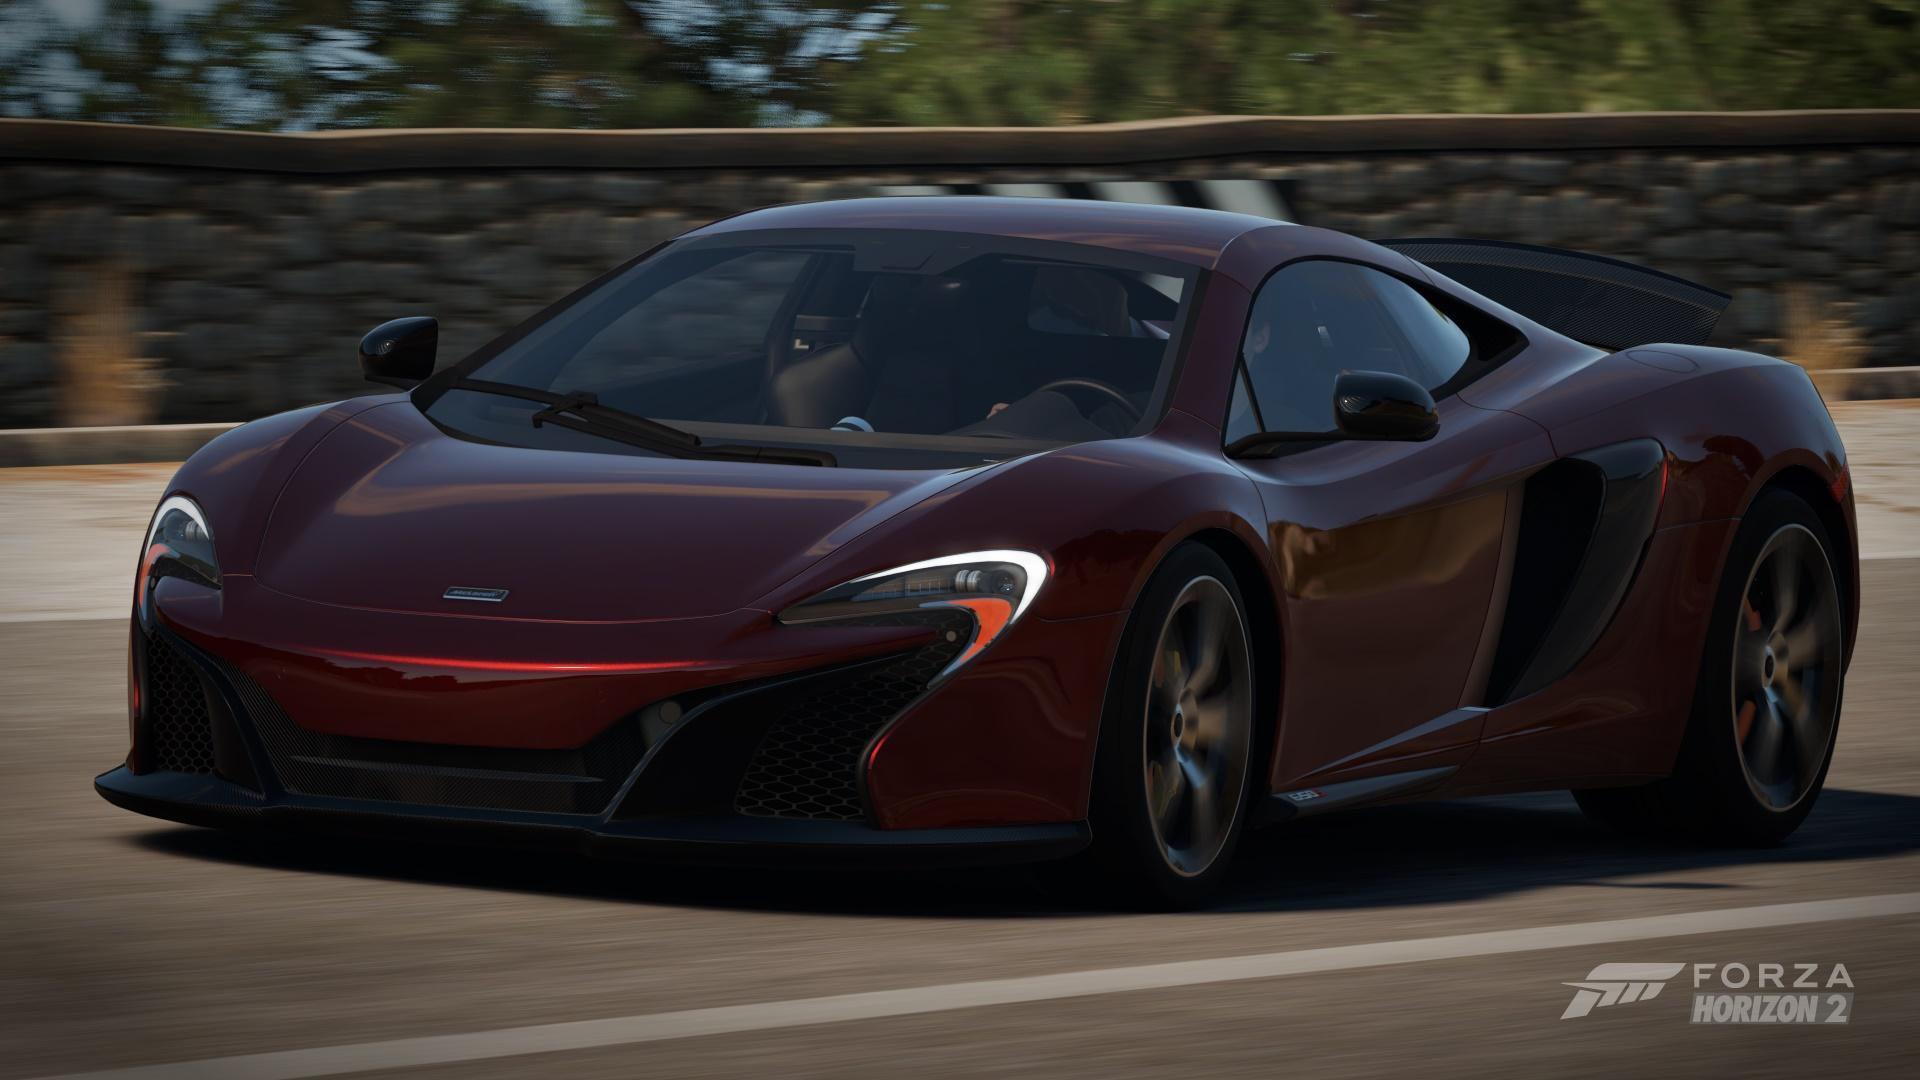 one of my favourite cars on forza horizon 2. my metallic volcano red